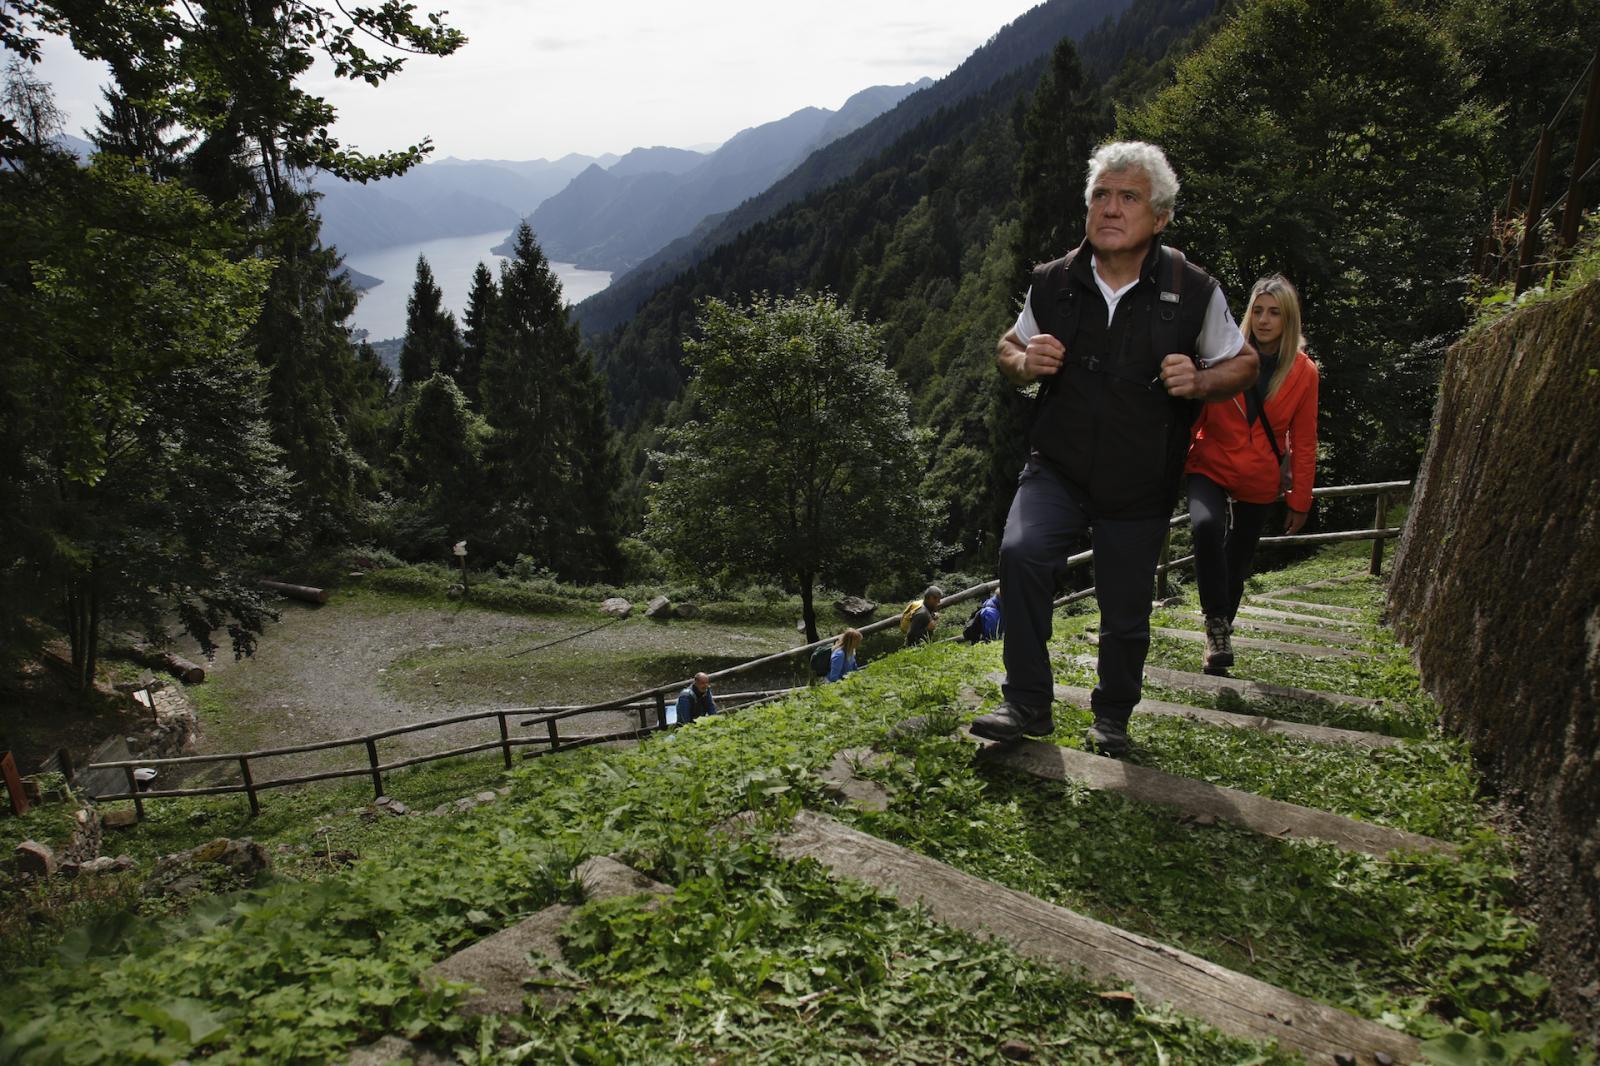 Trekking Paese, Miniere e Malghe